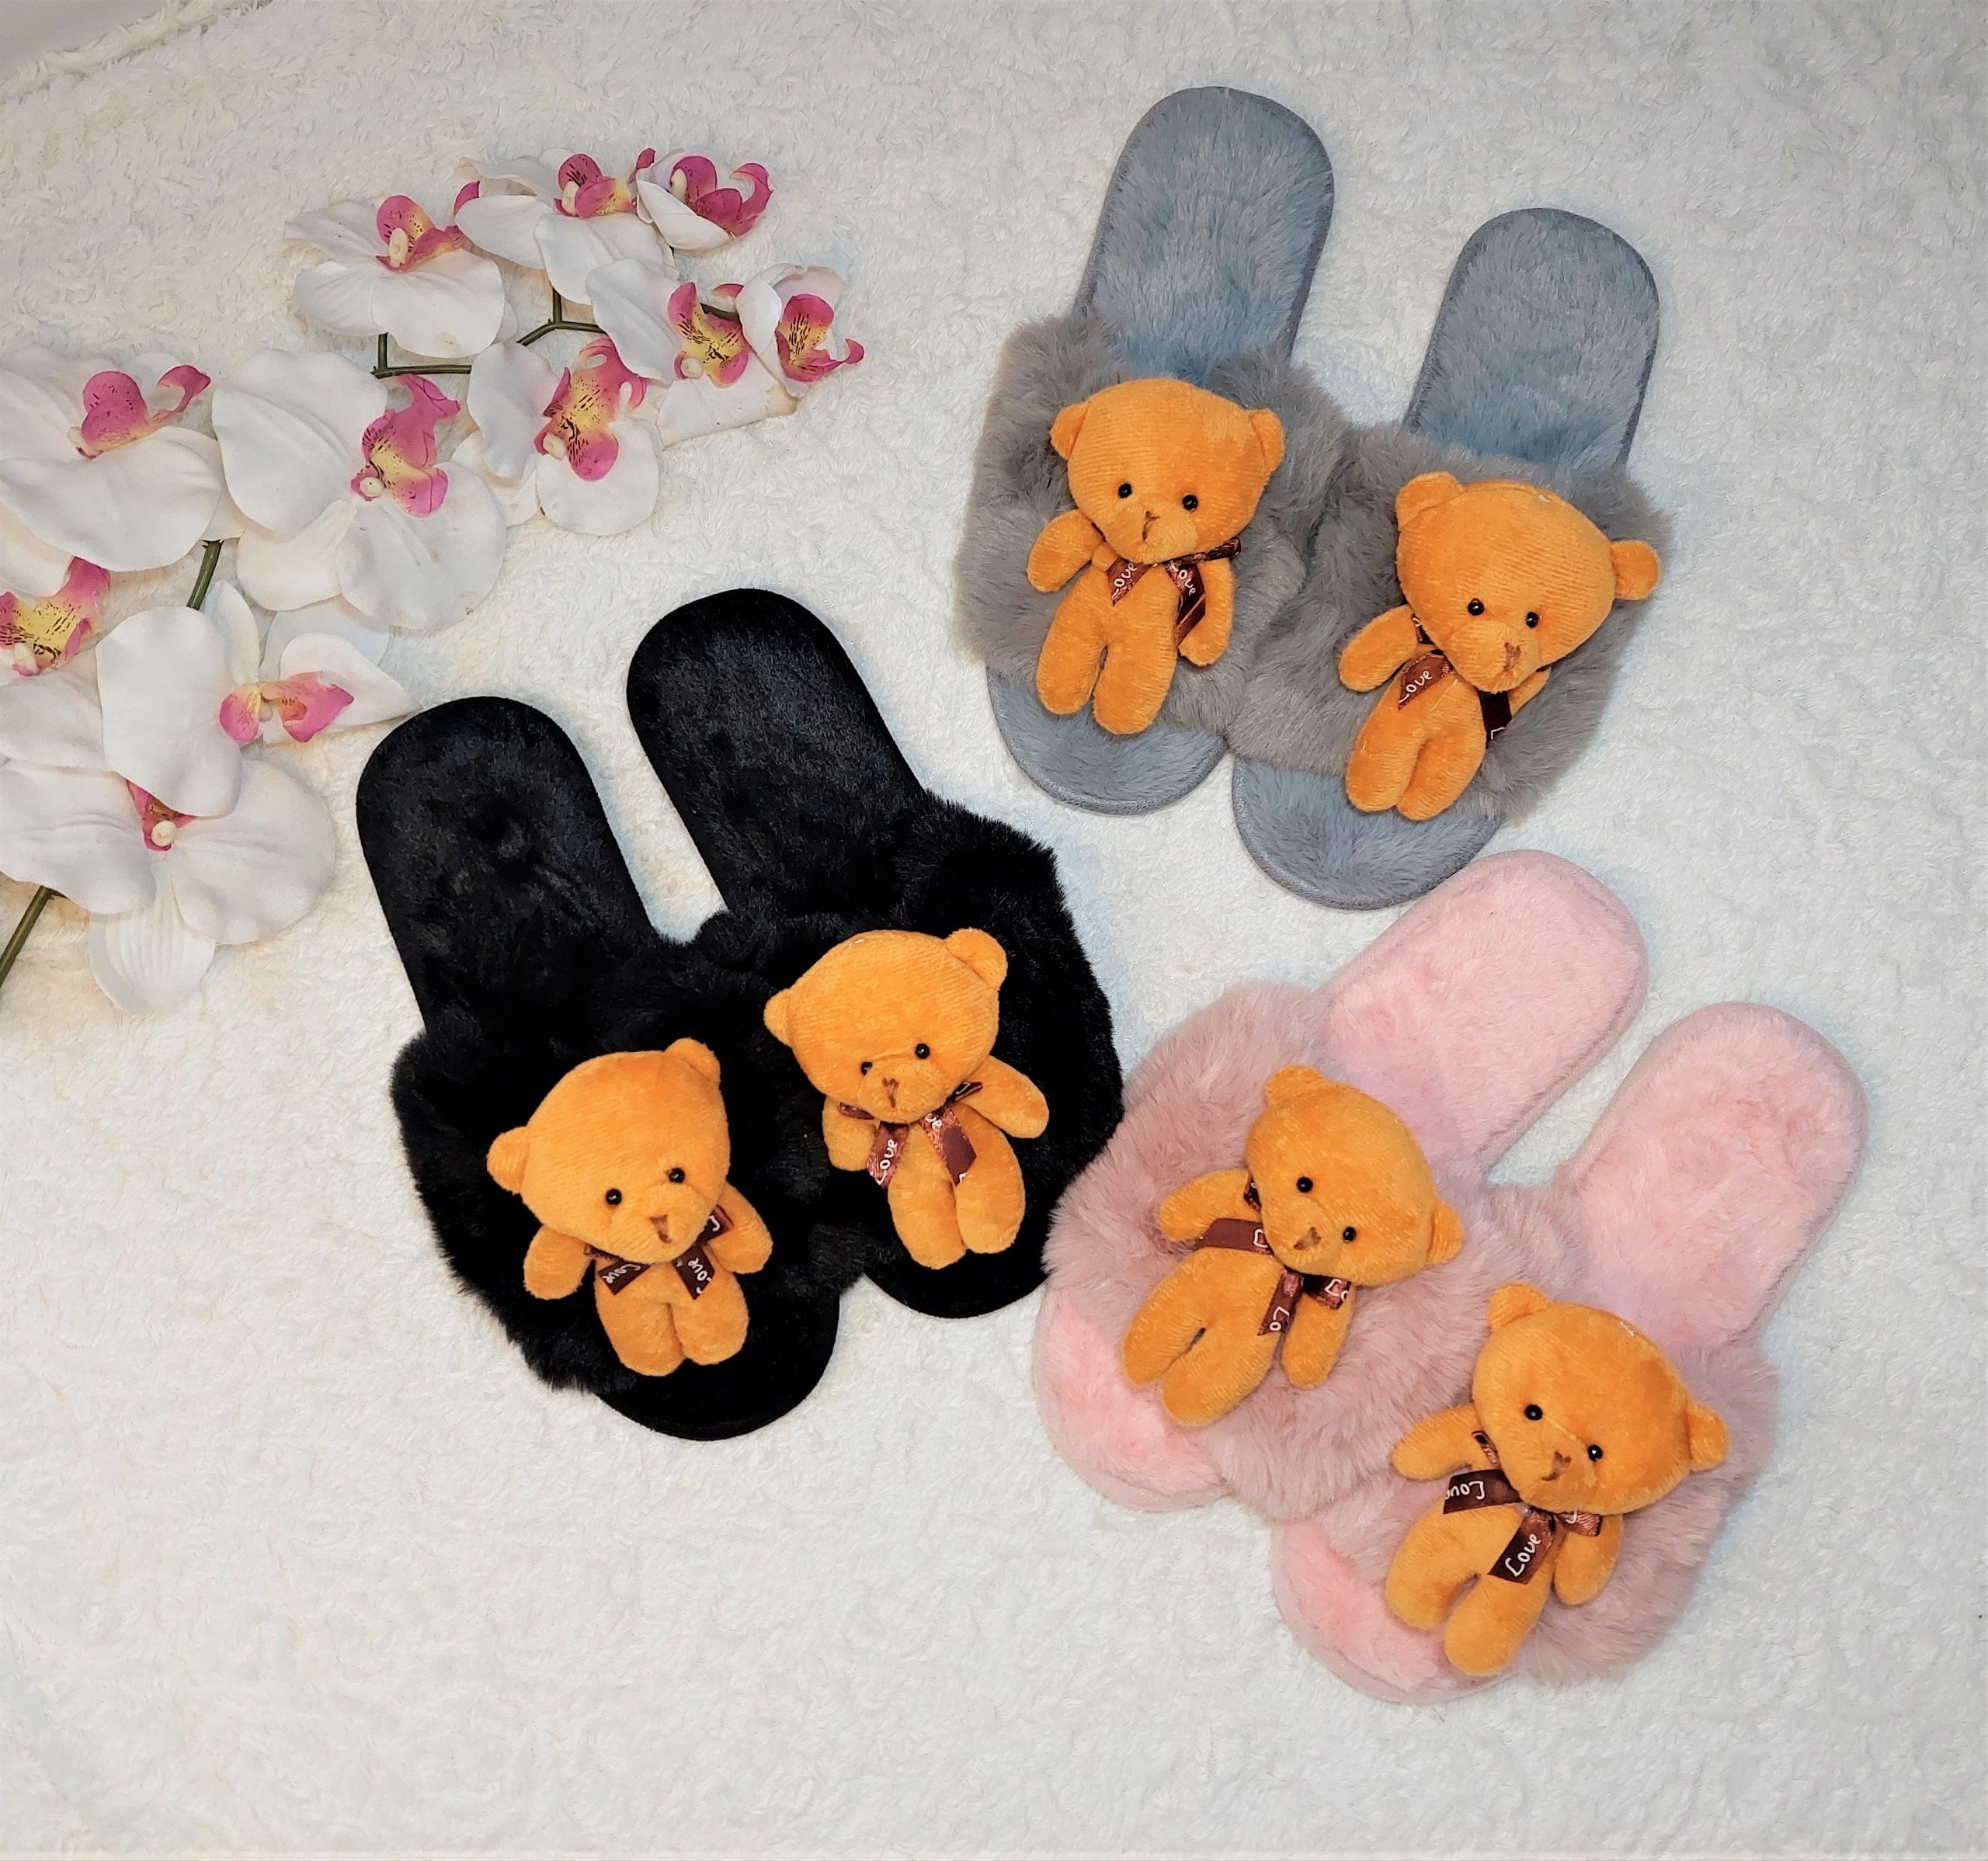 Teddy papucs